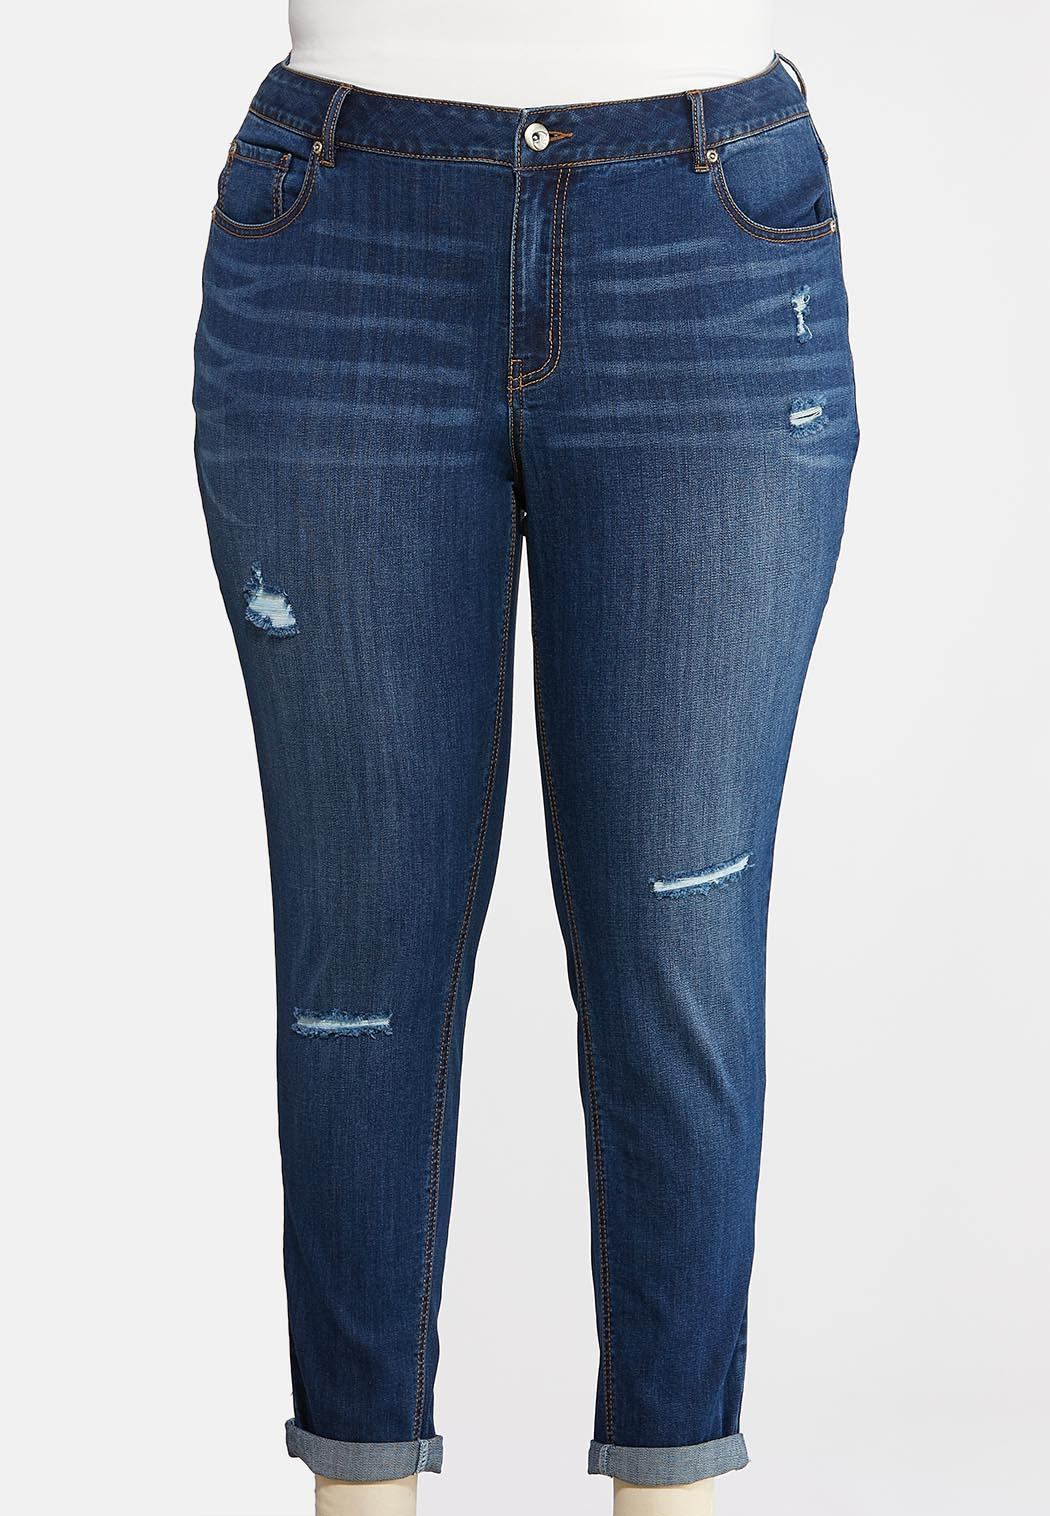 ac3c7df336dd8 Plus Size Dark Distressed Jeans Denim Cato Fashions